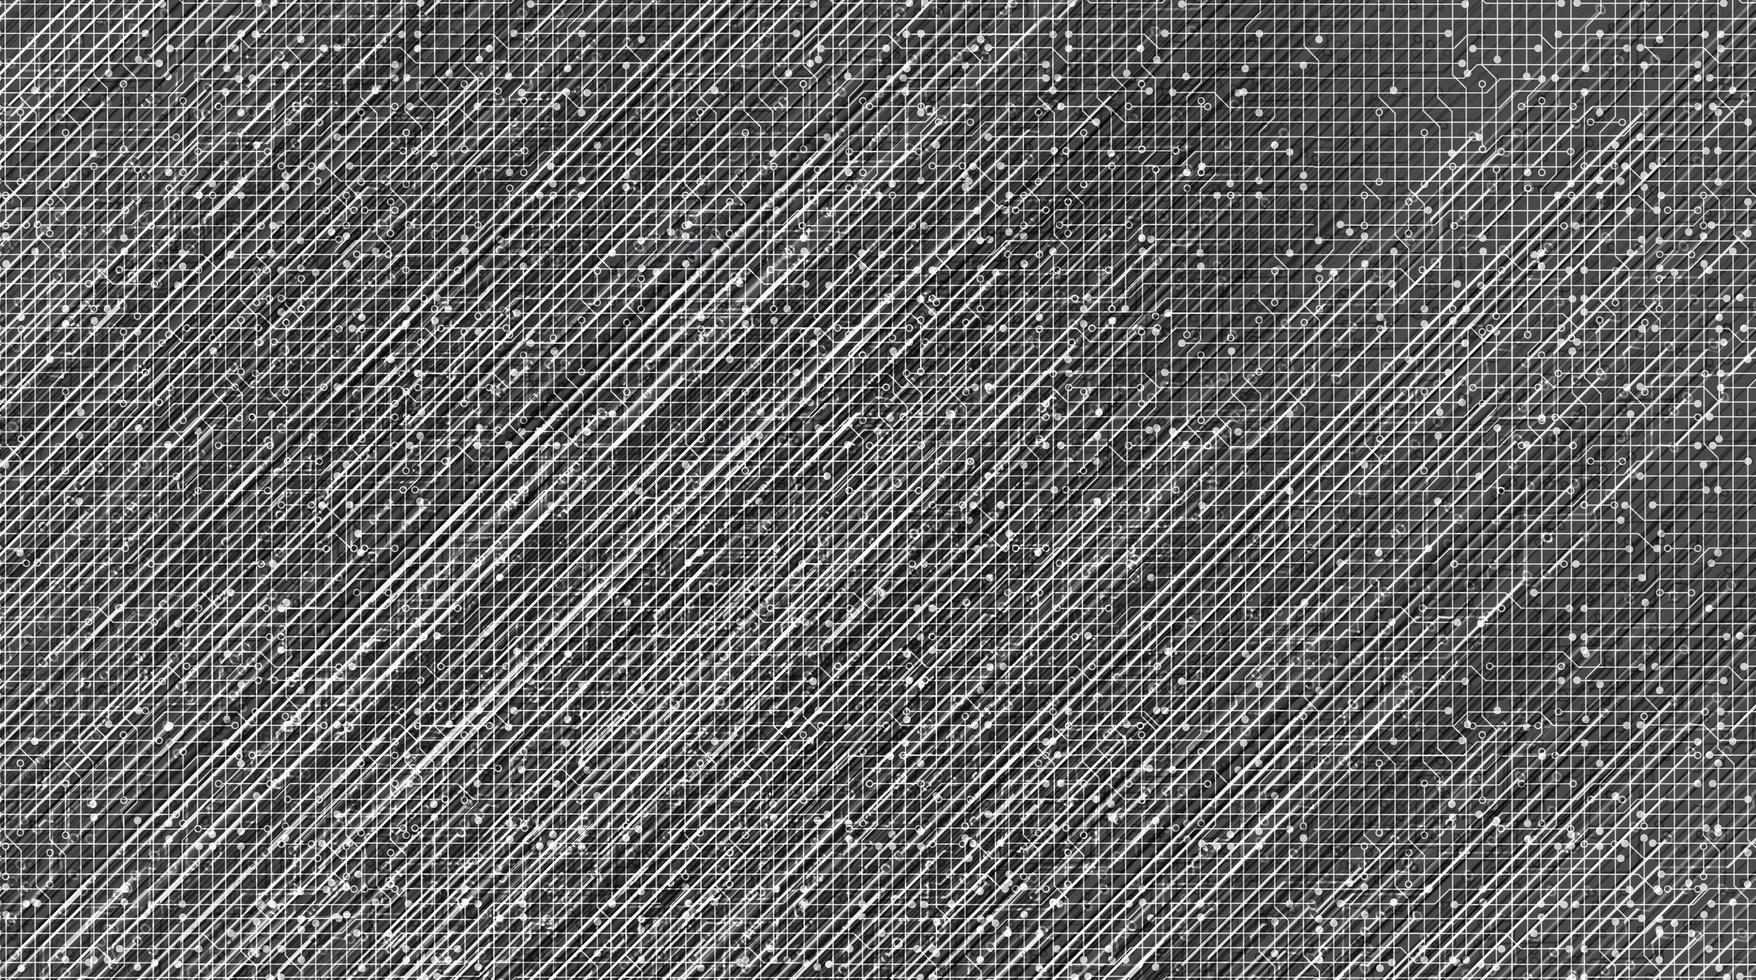 hastighet grå teknik bakgrund vektor